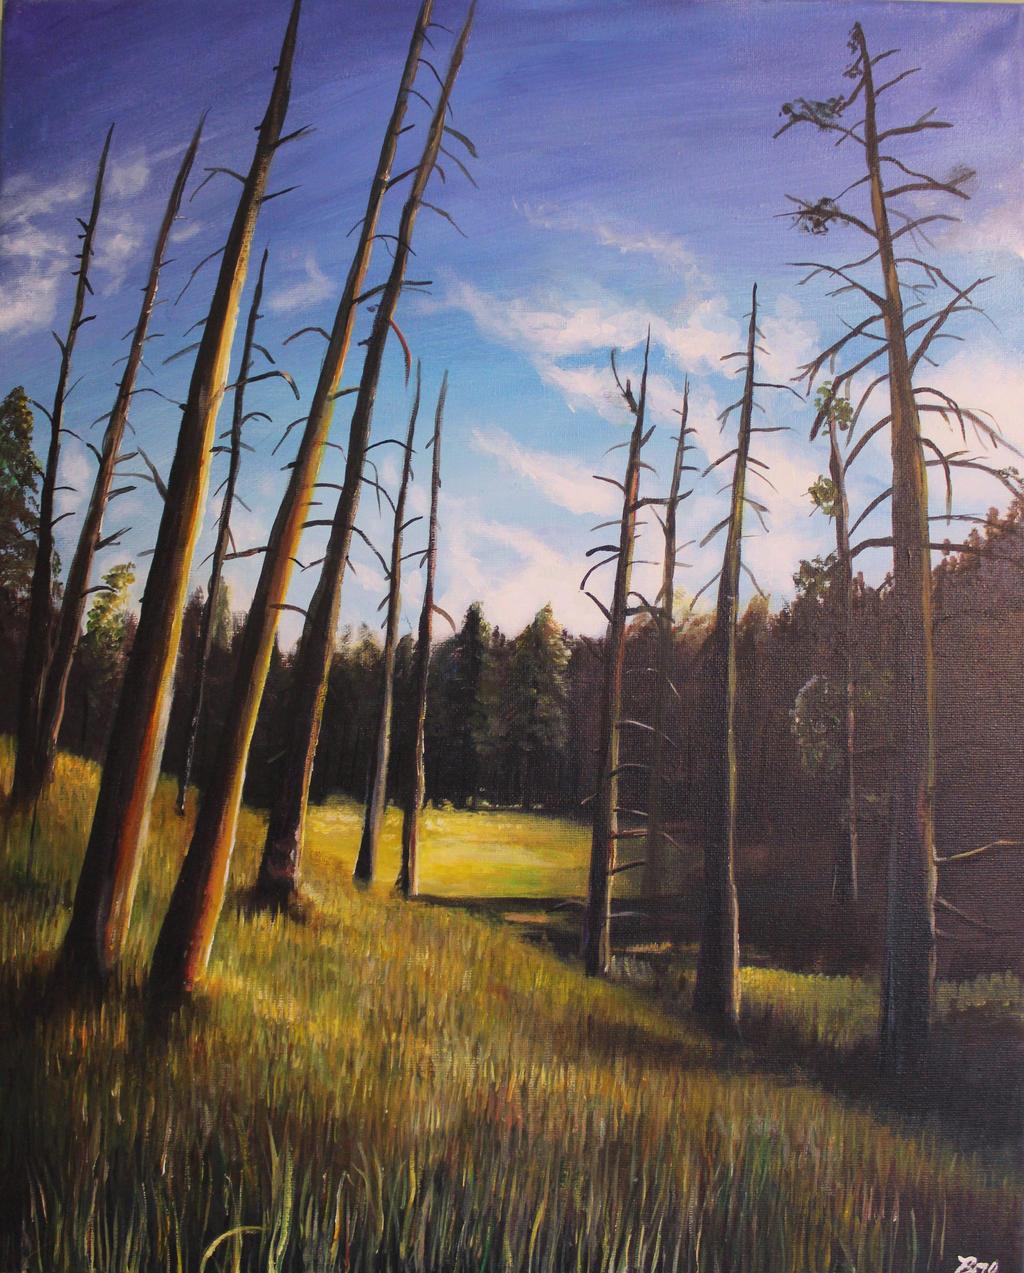 Dead Tree Landscape by Marybriannemckay